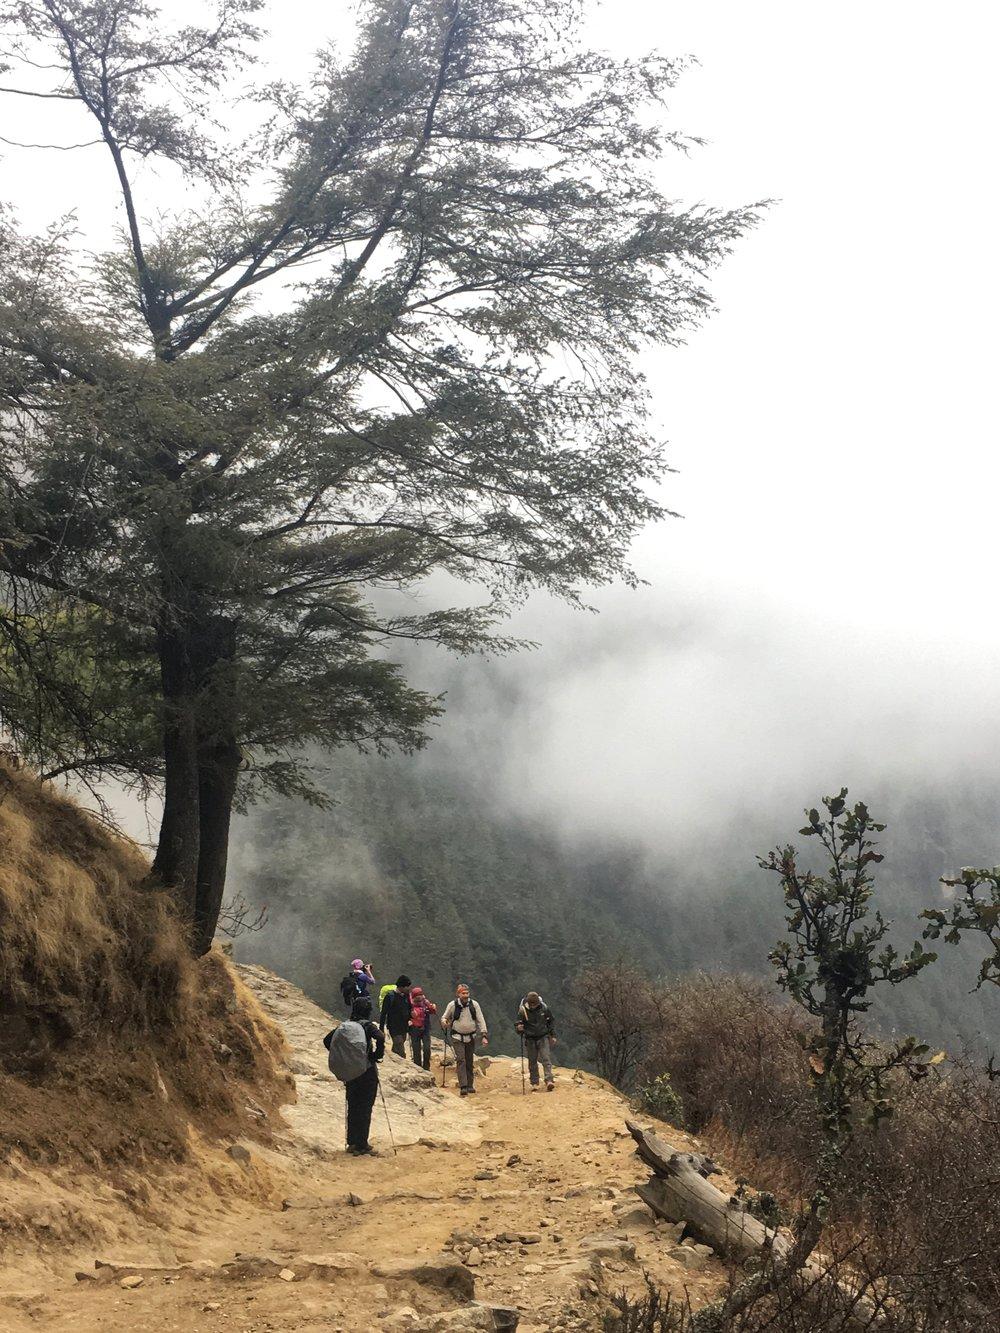 Trekkers on their way up to Namche Bazaar, Nepal.